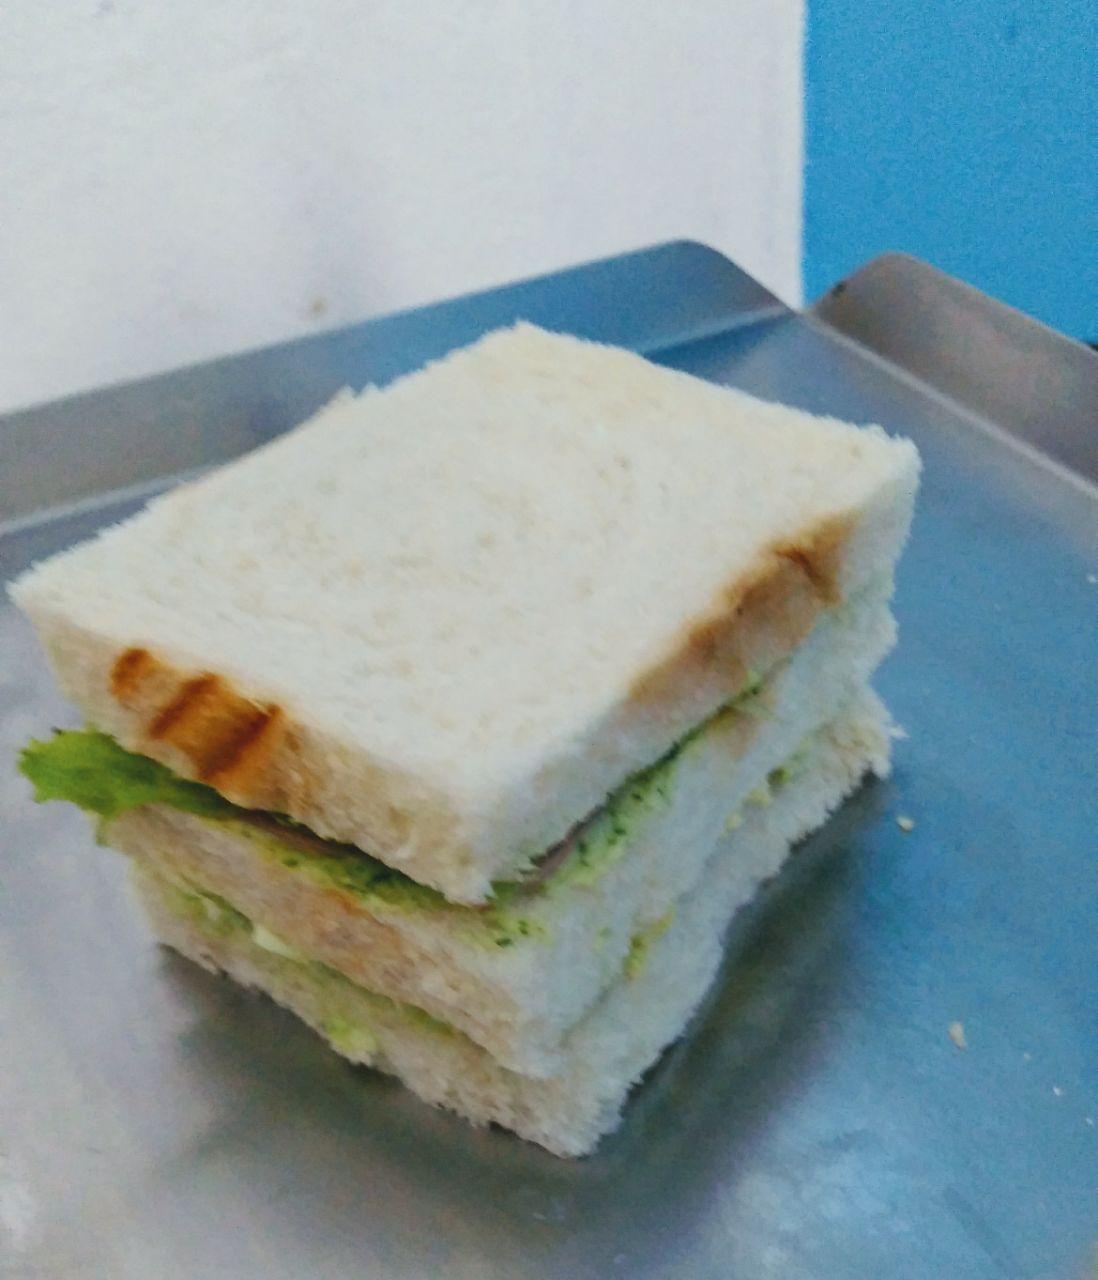 Mustard sandwich (sanduíche de mostarda com mel)